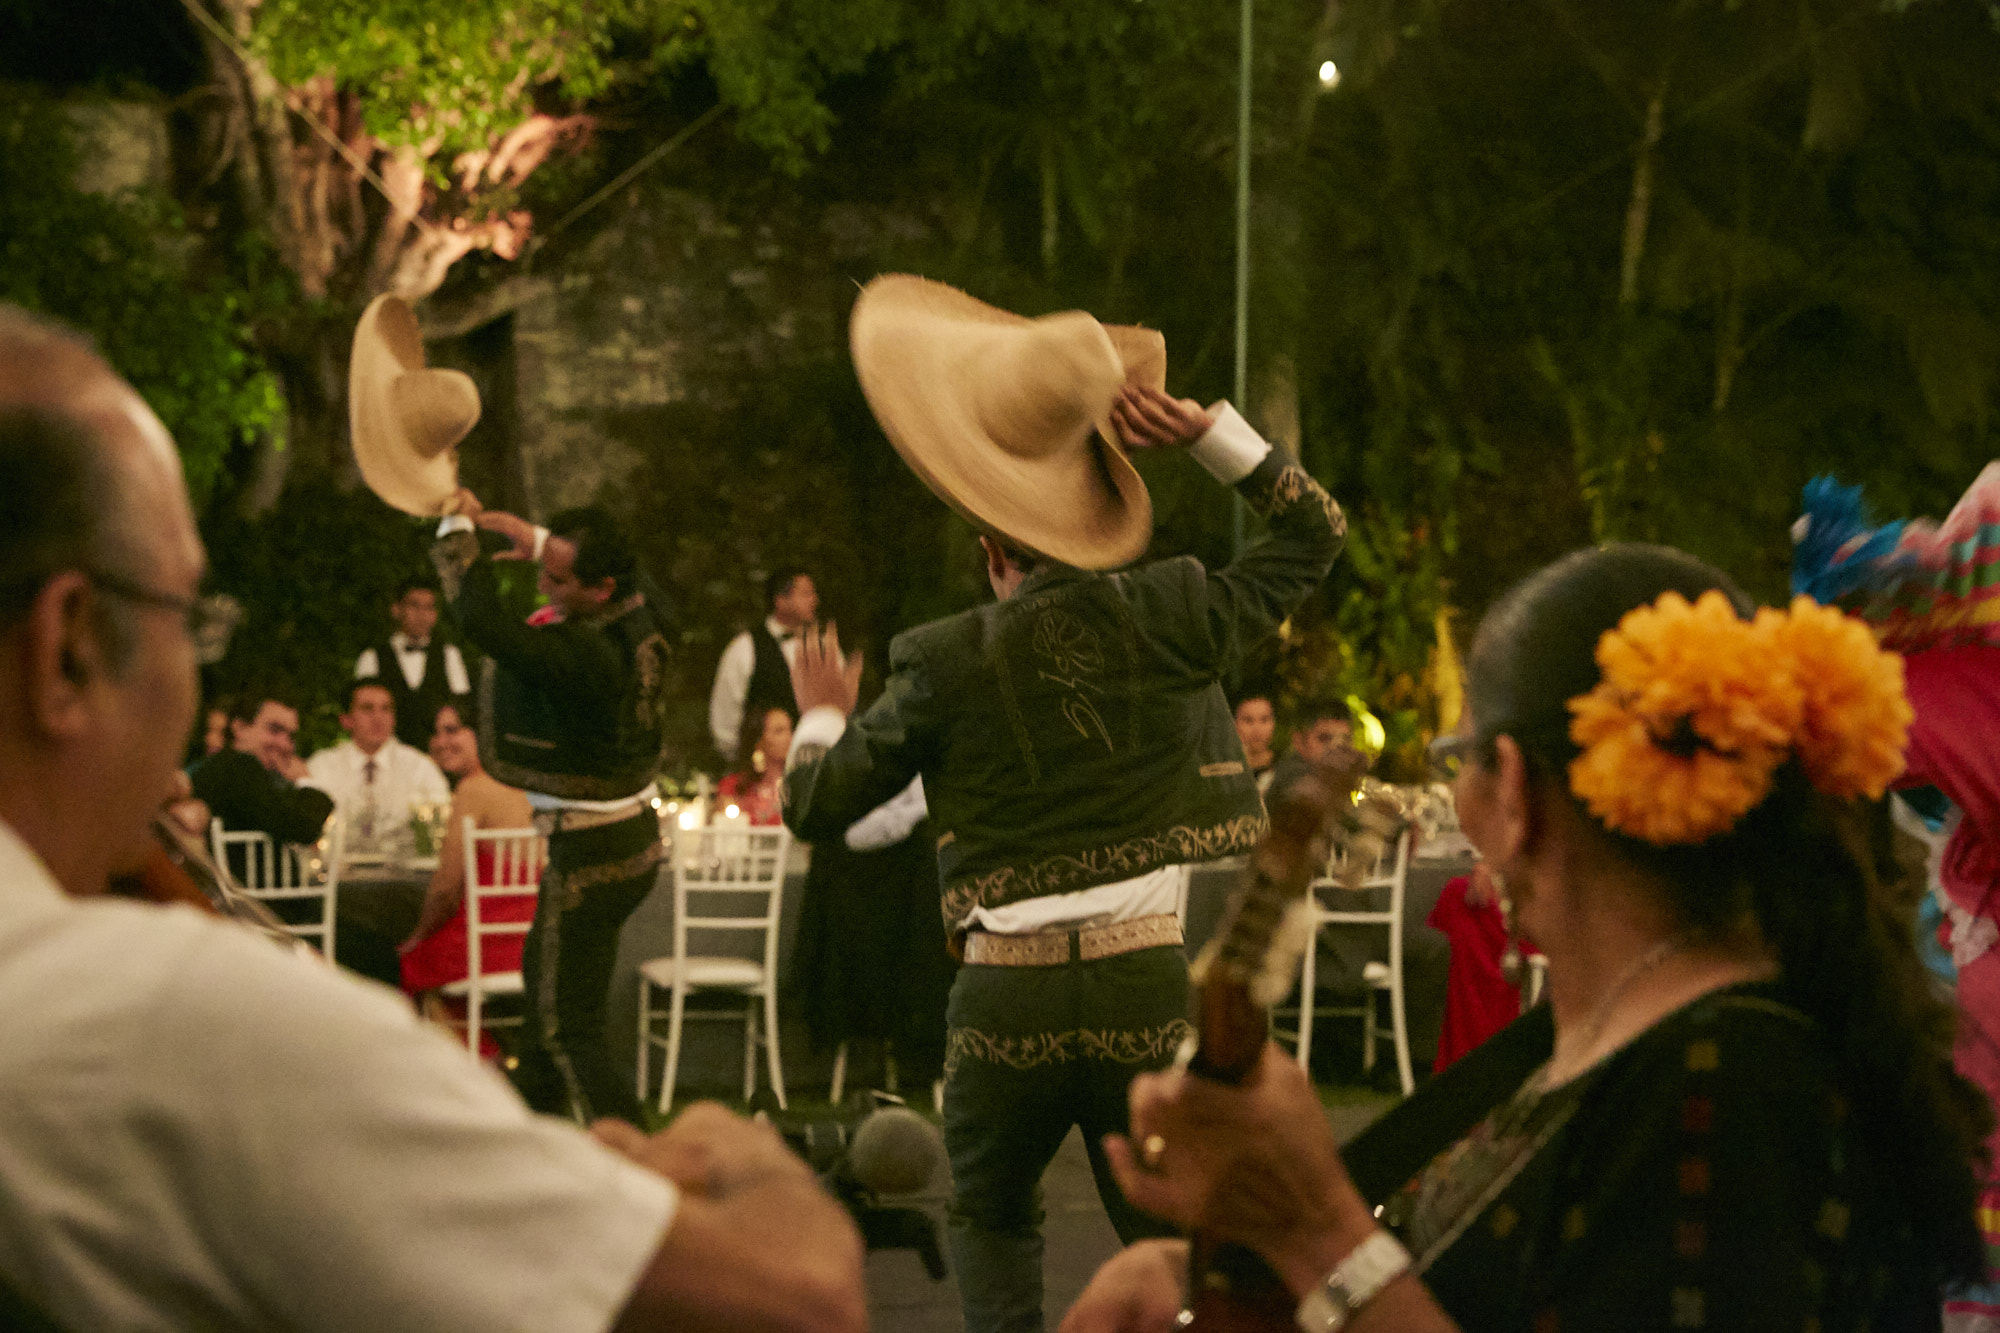 LJL_GabbyandIVan_Mexico_089.jpg